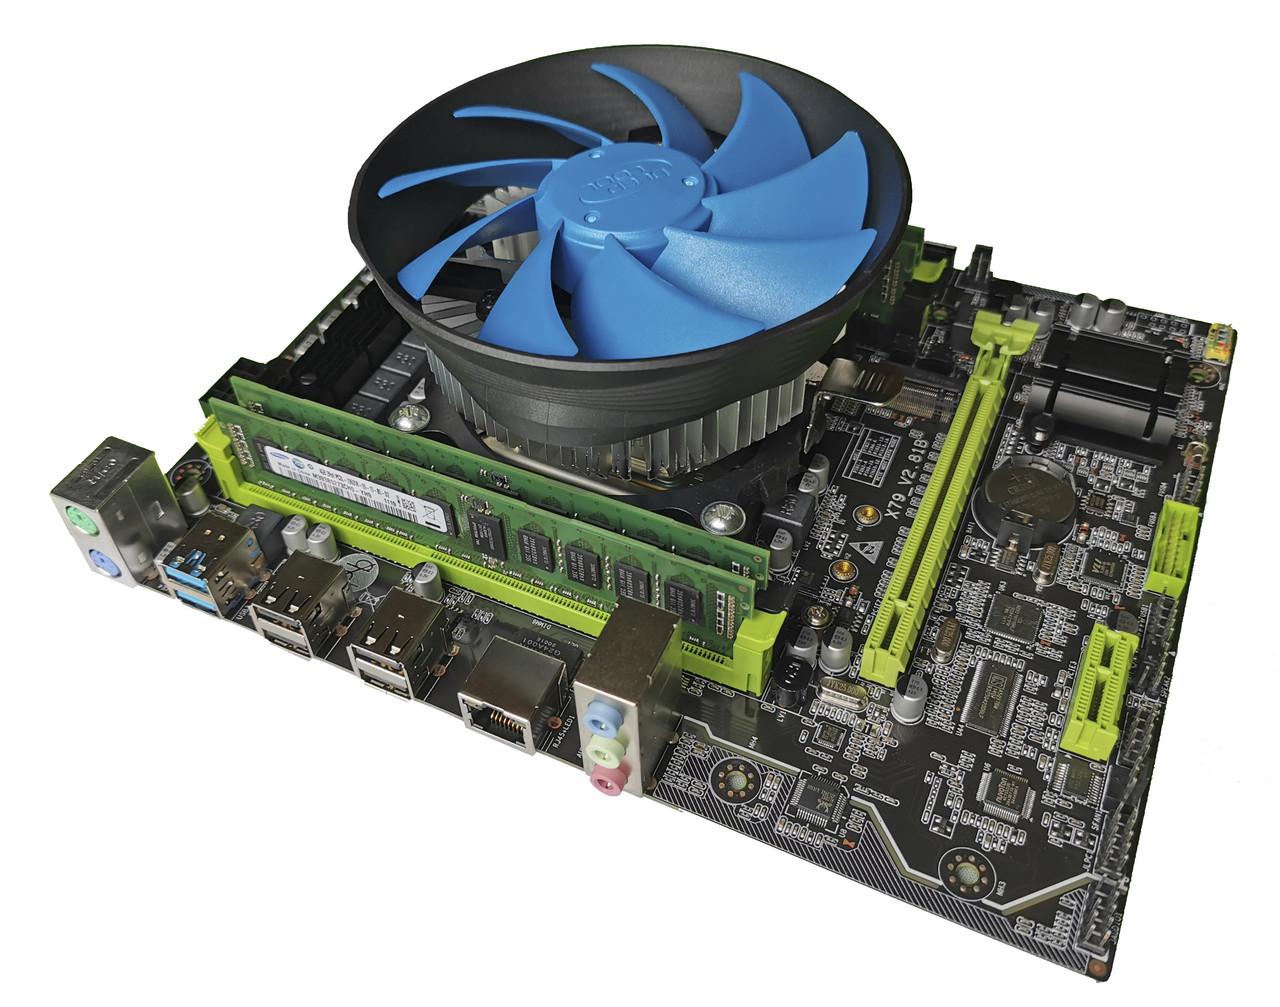 Комплект X79 2.82 + Xeon E5-1620v2 + 16 GB RAM + Кулер, LGA 2011